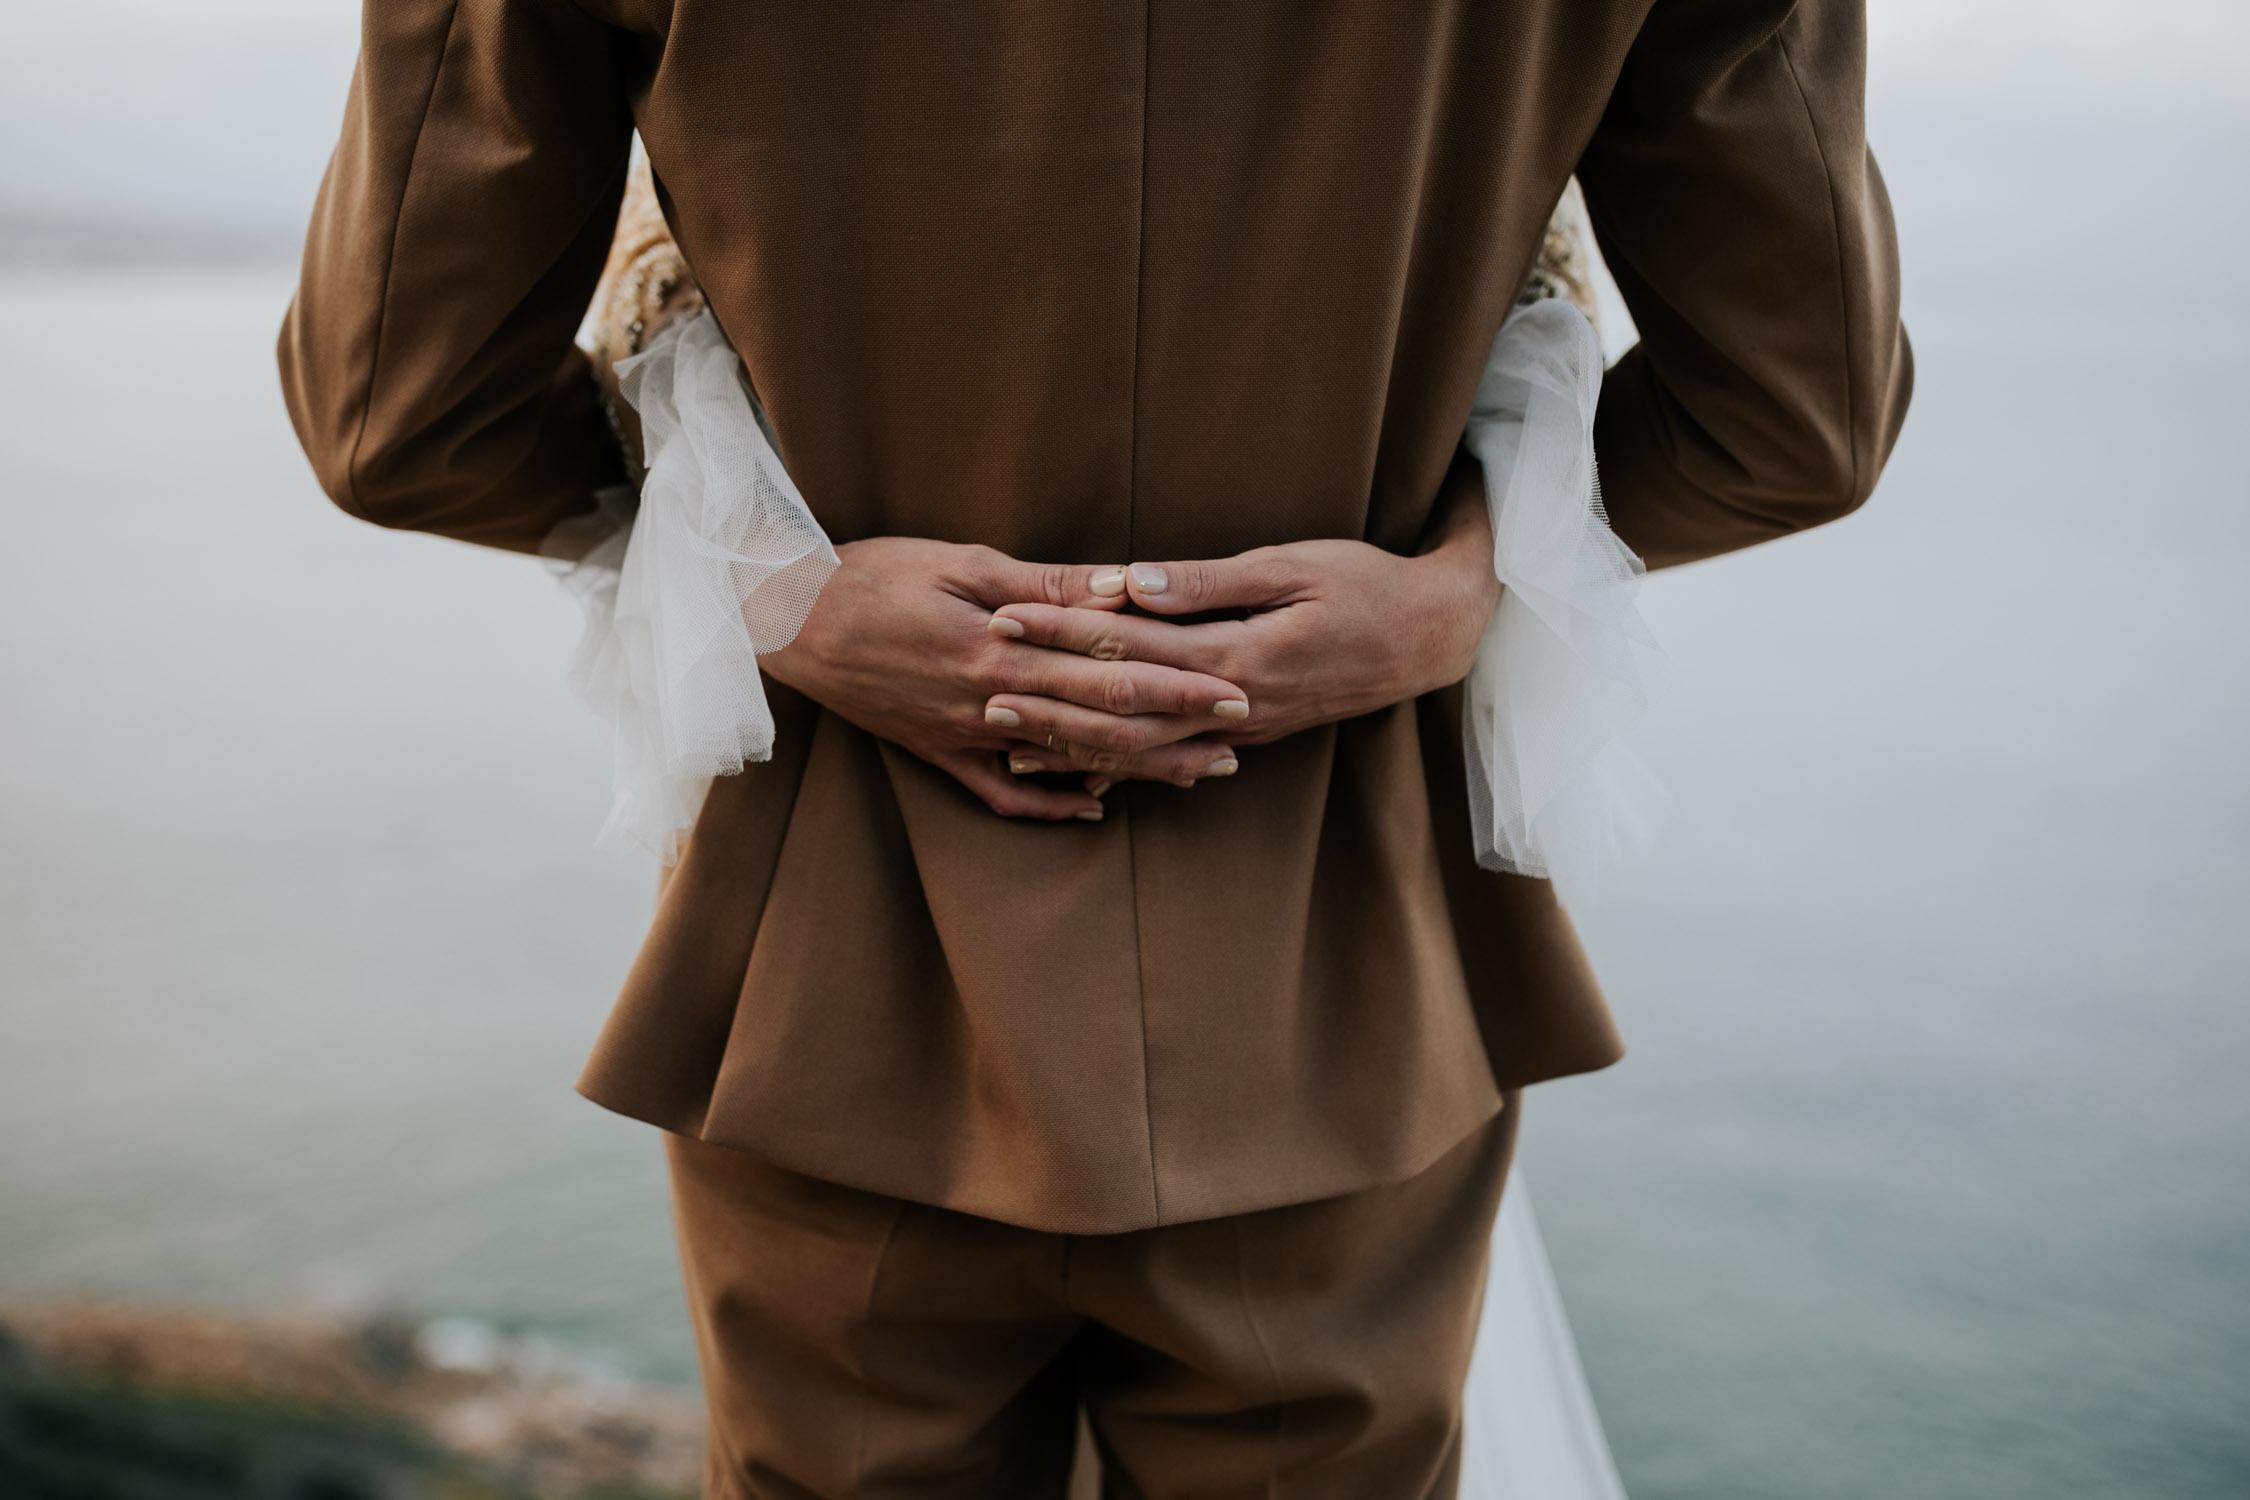 Groom holds bride overlooking ocean